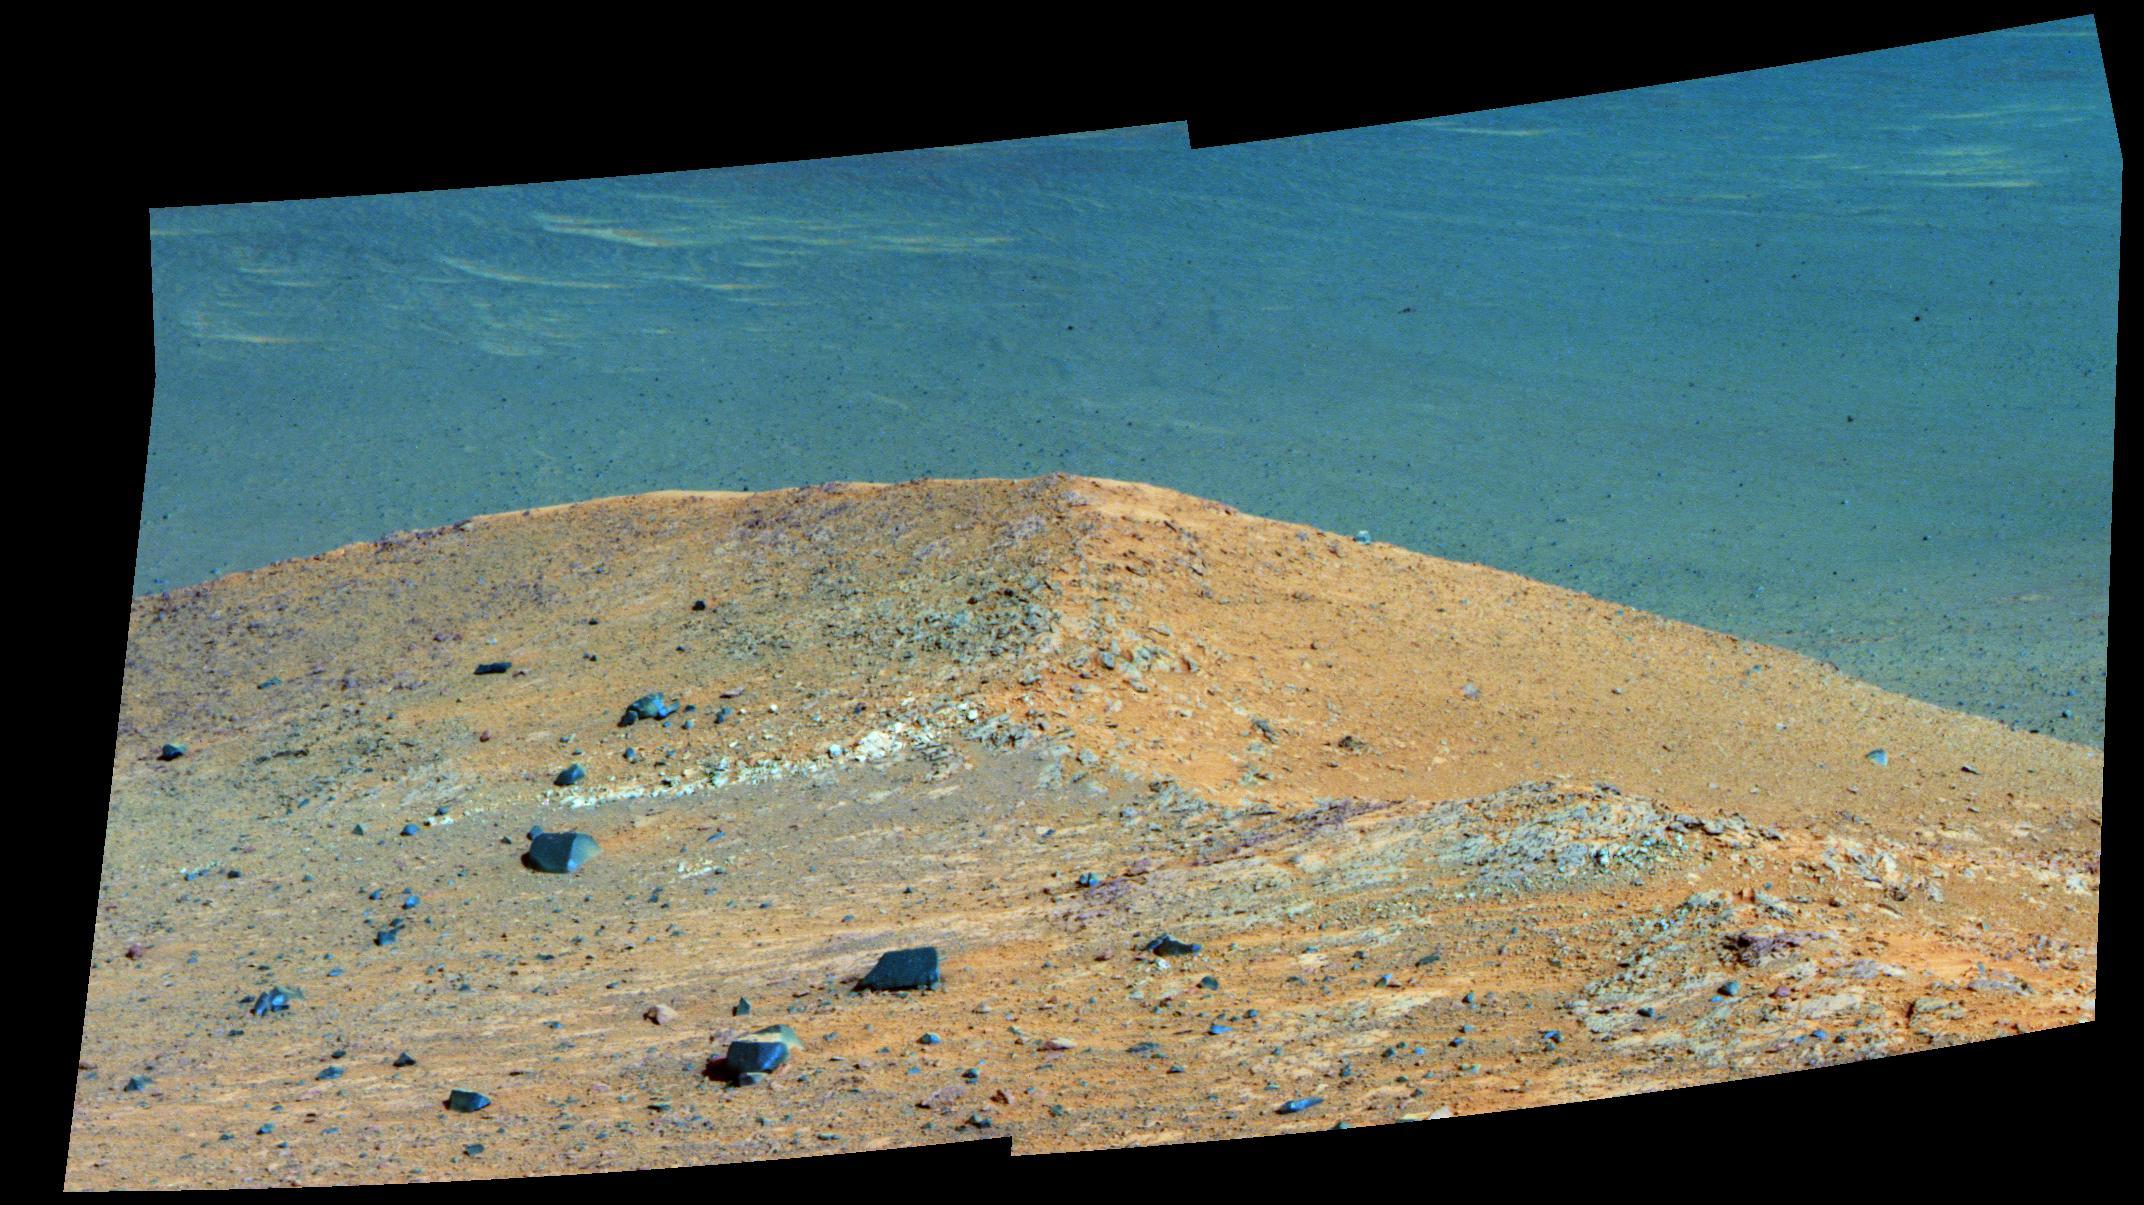 mars rover spirit - HD1600×800